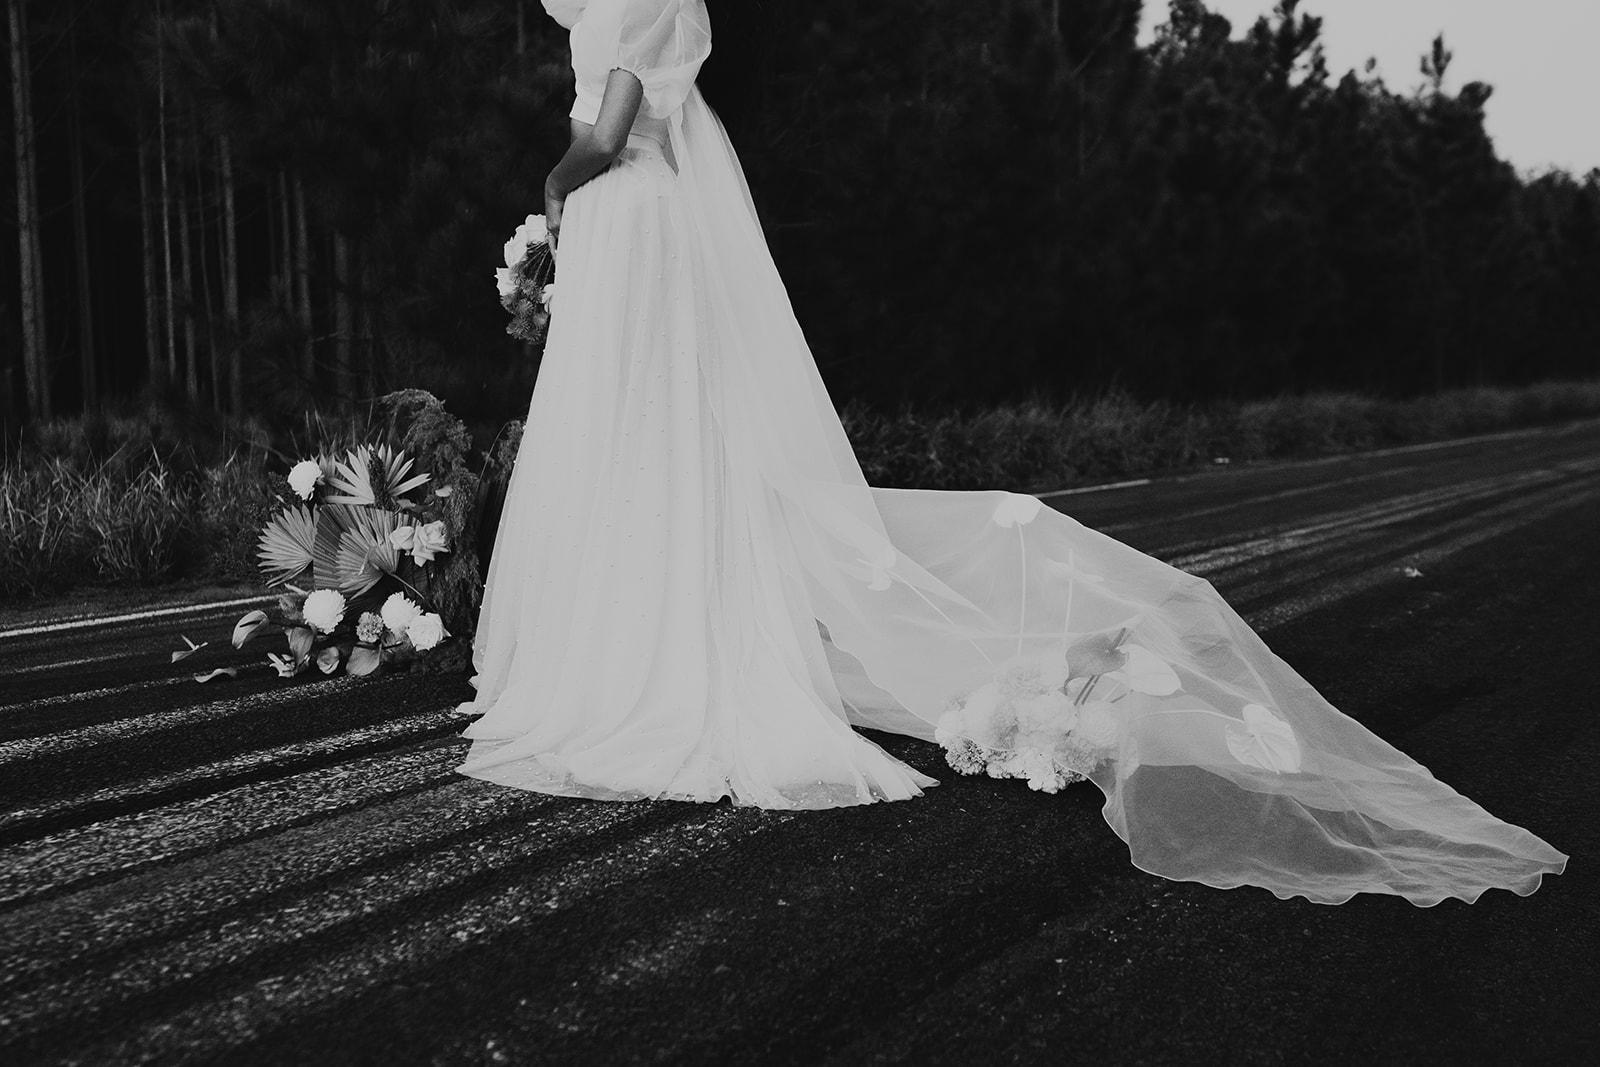 angela cannavo photography karen willis holmes skirt alternative bridal bouquet florals